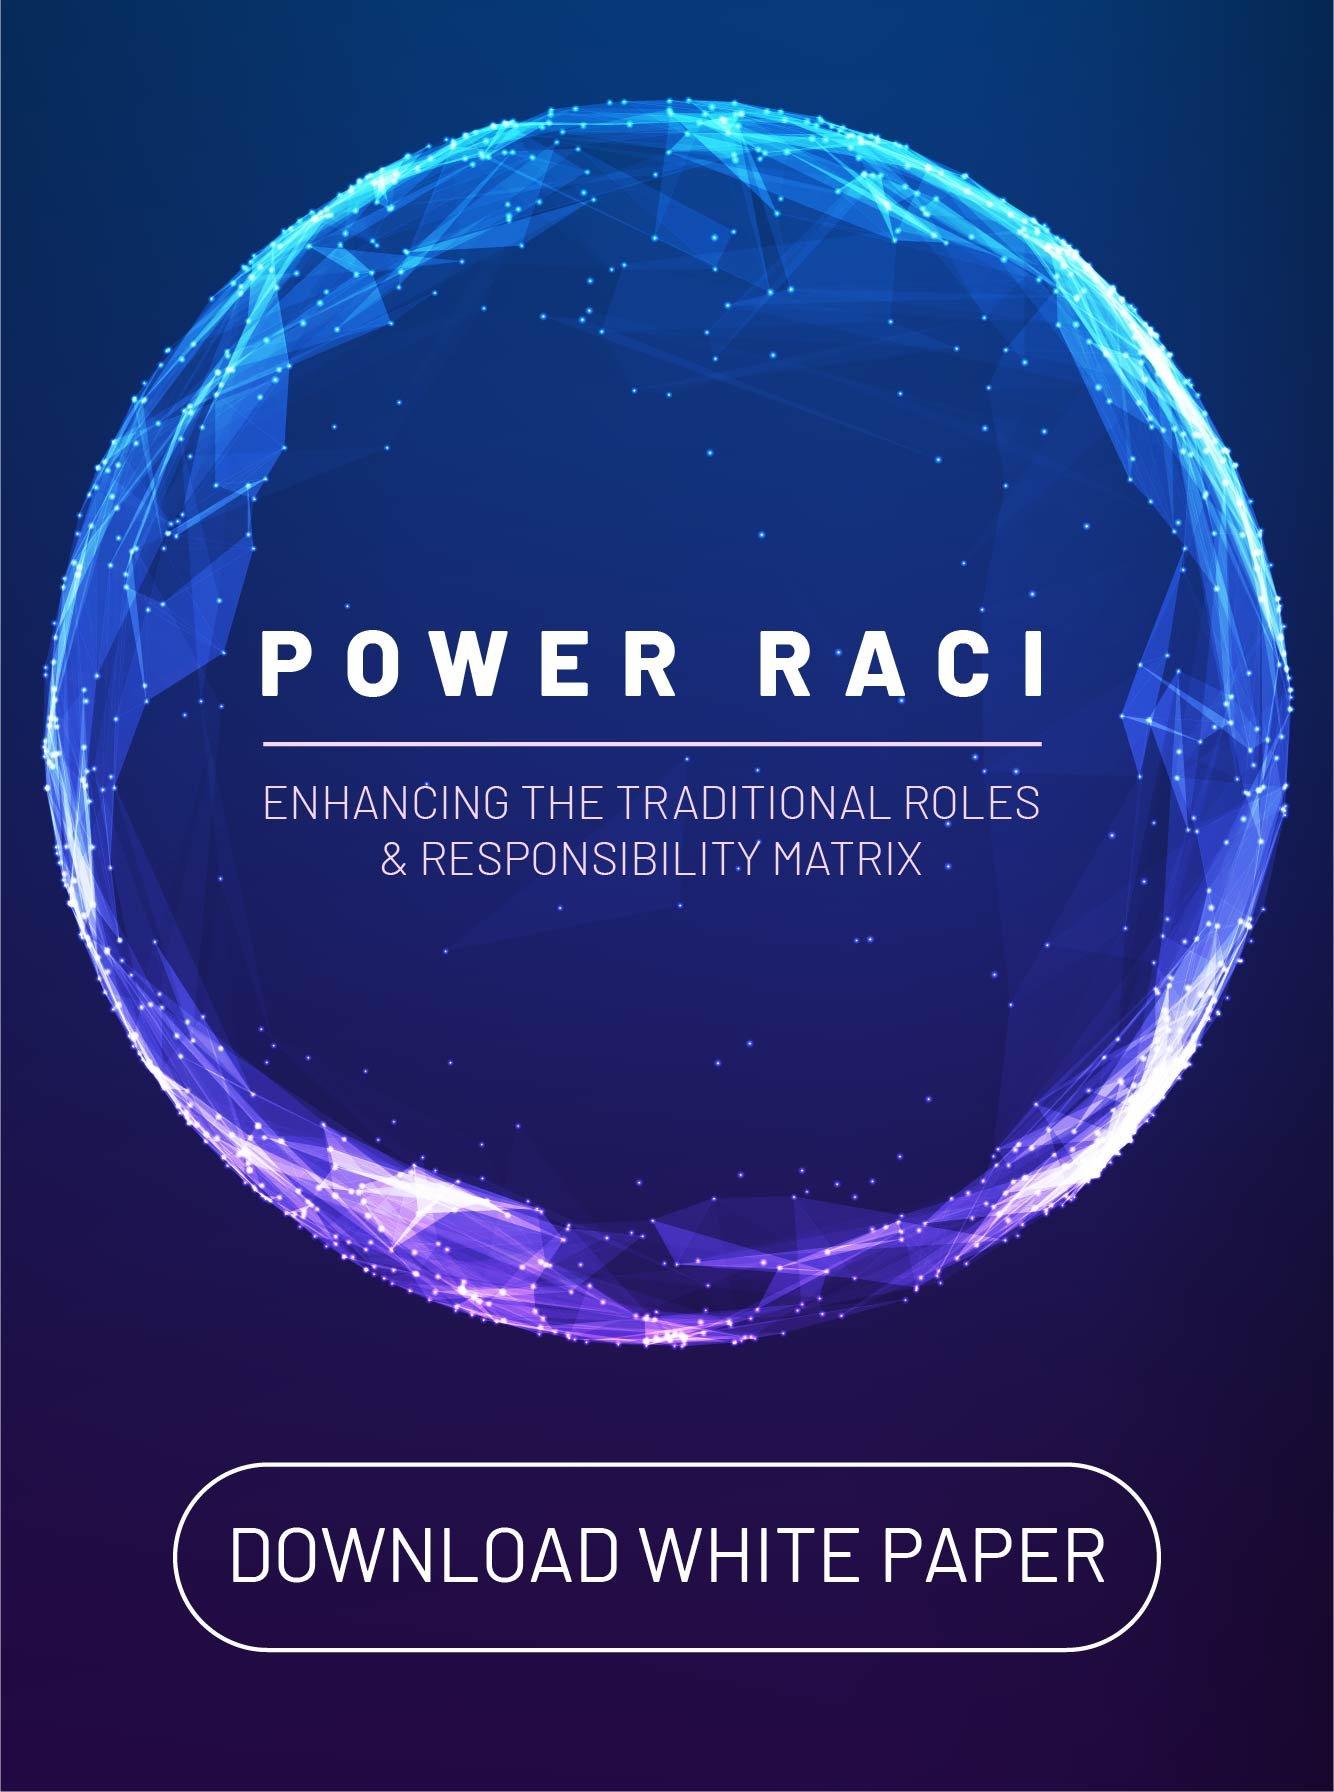 Power RACI